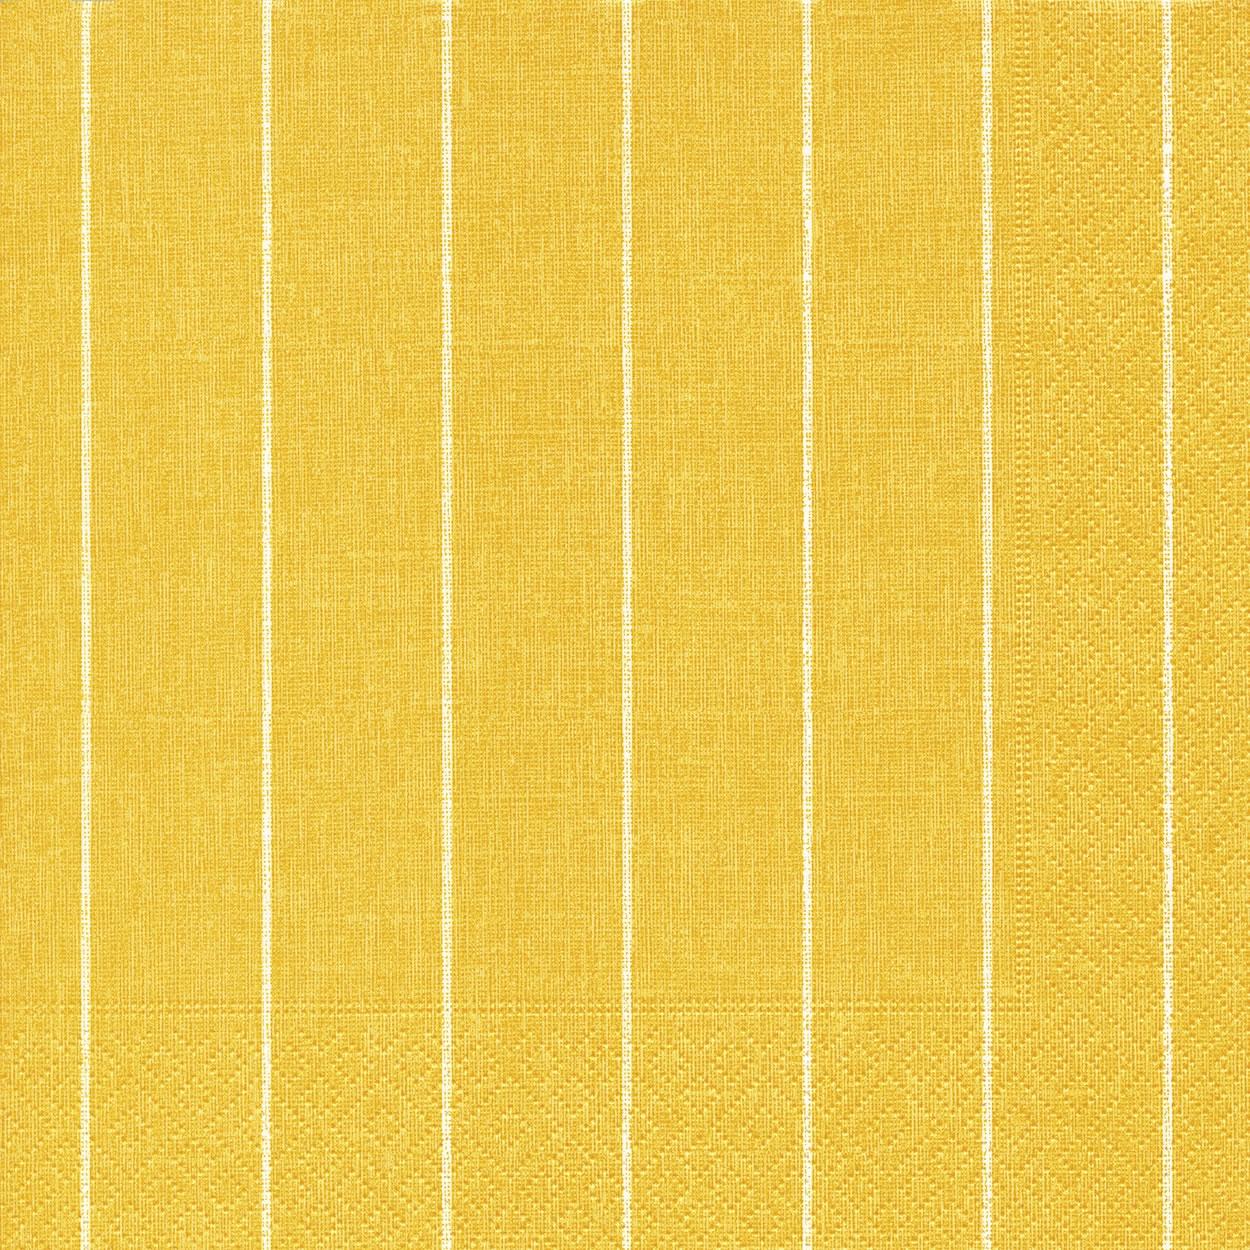 Napkins 40x40 cm - Home yellow